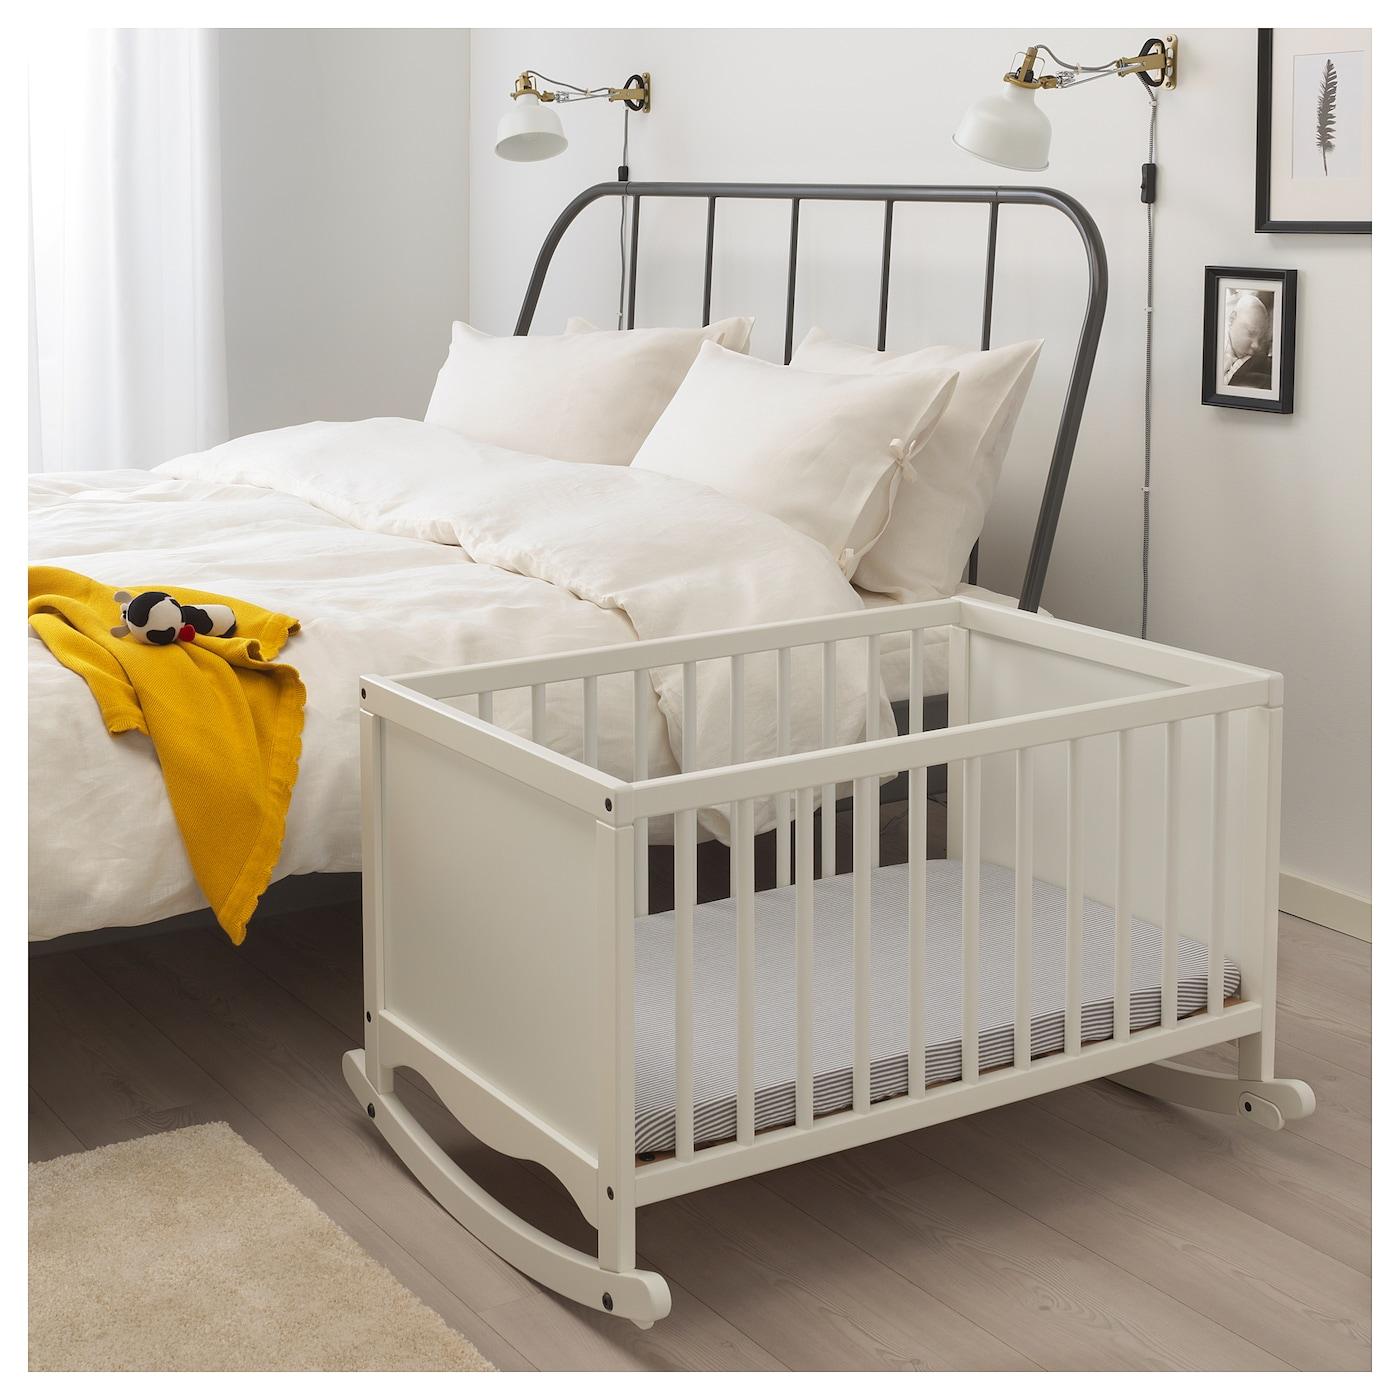 "SOLGUL Cradle with sleeping pad, white, 26x33 1/8 """